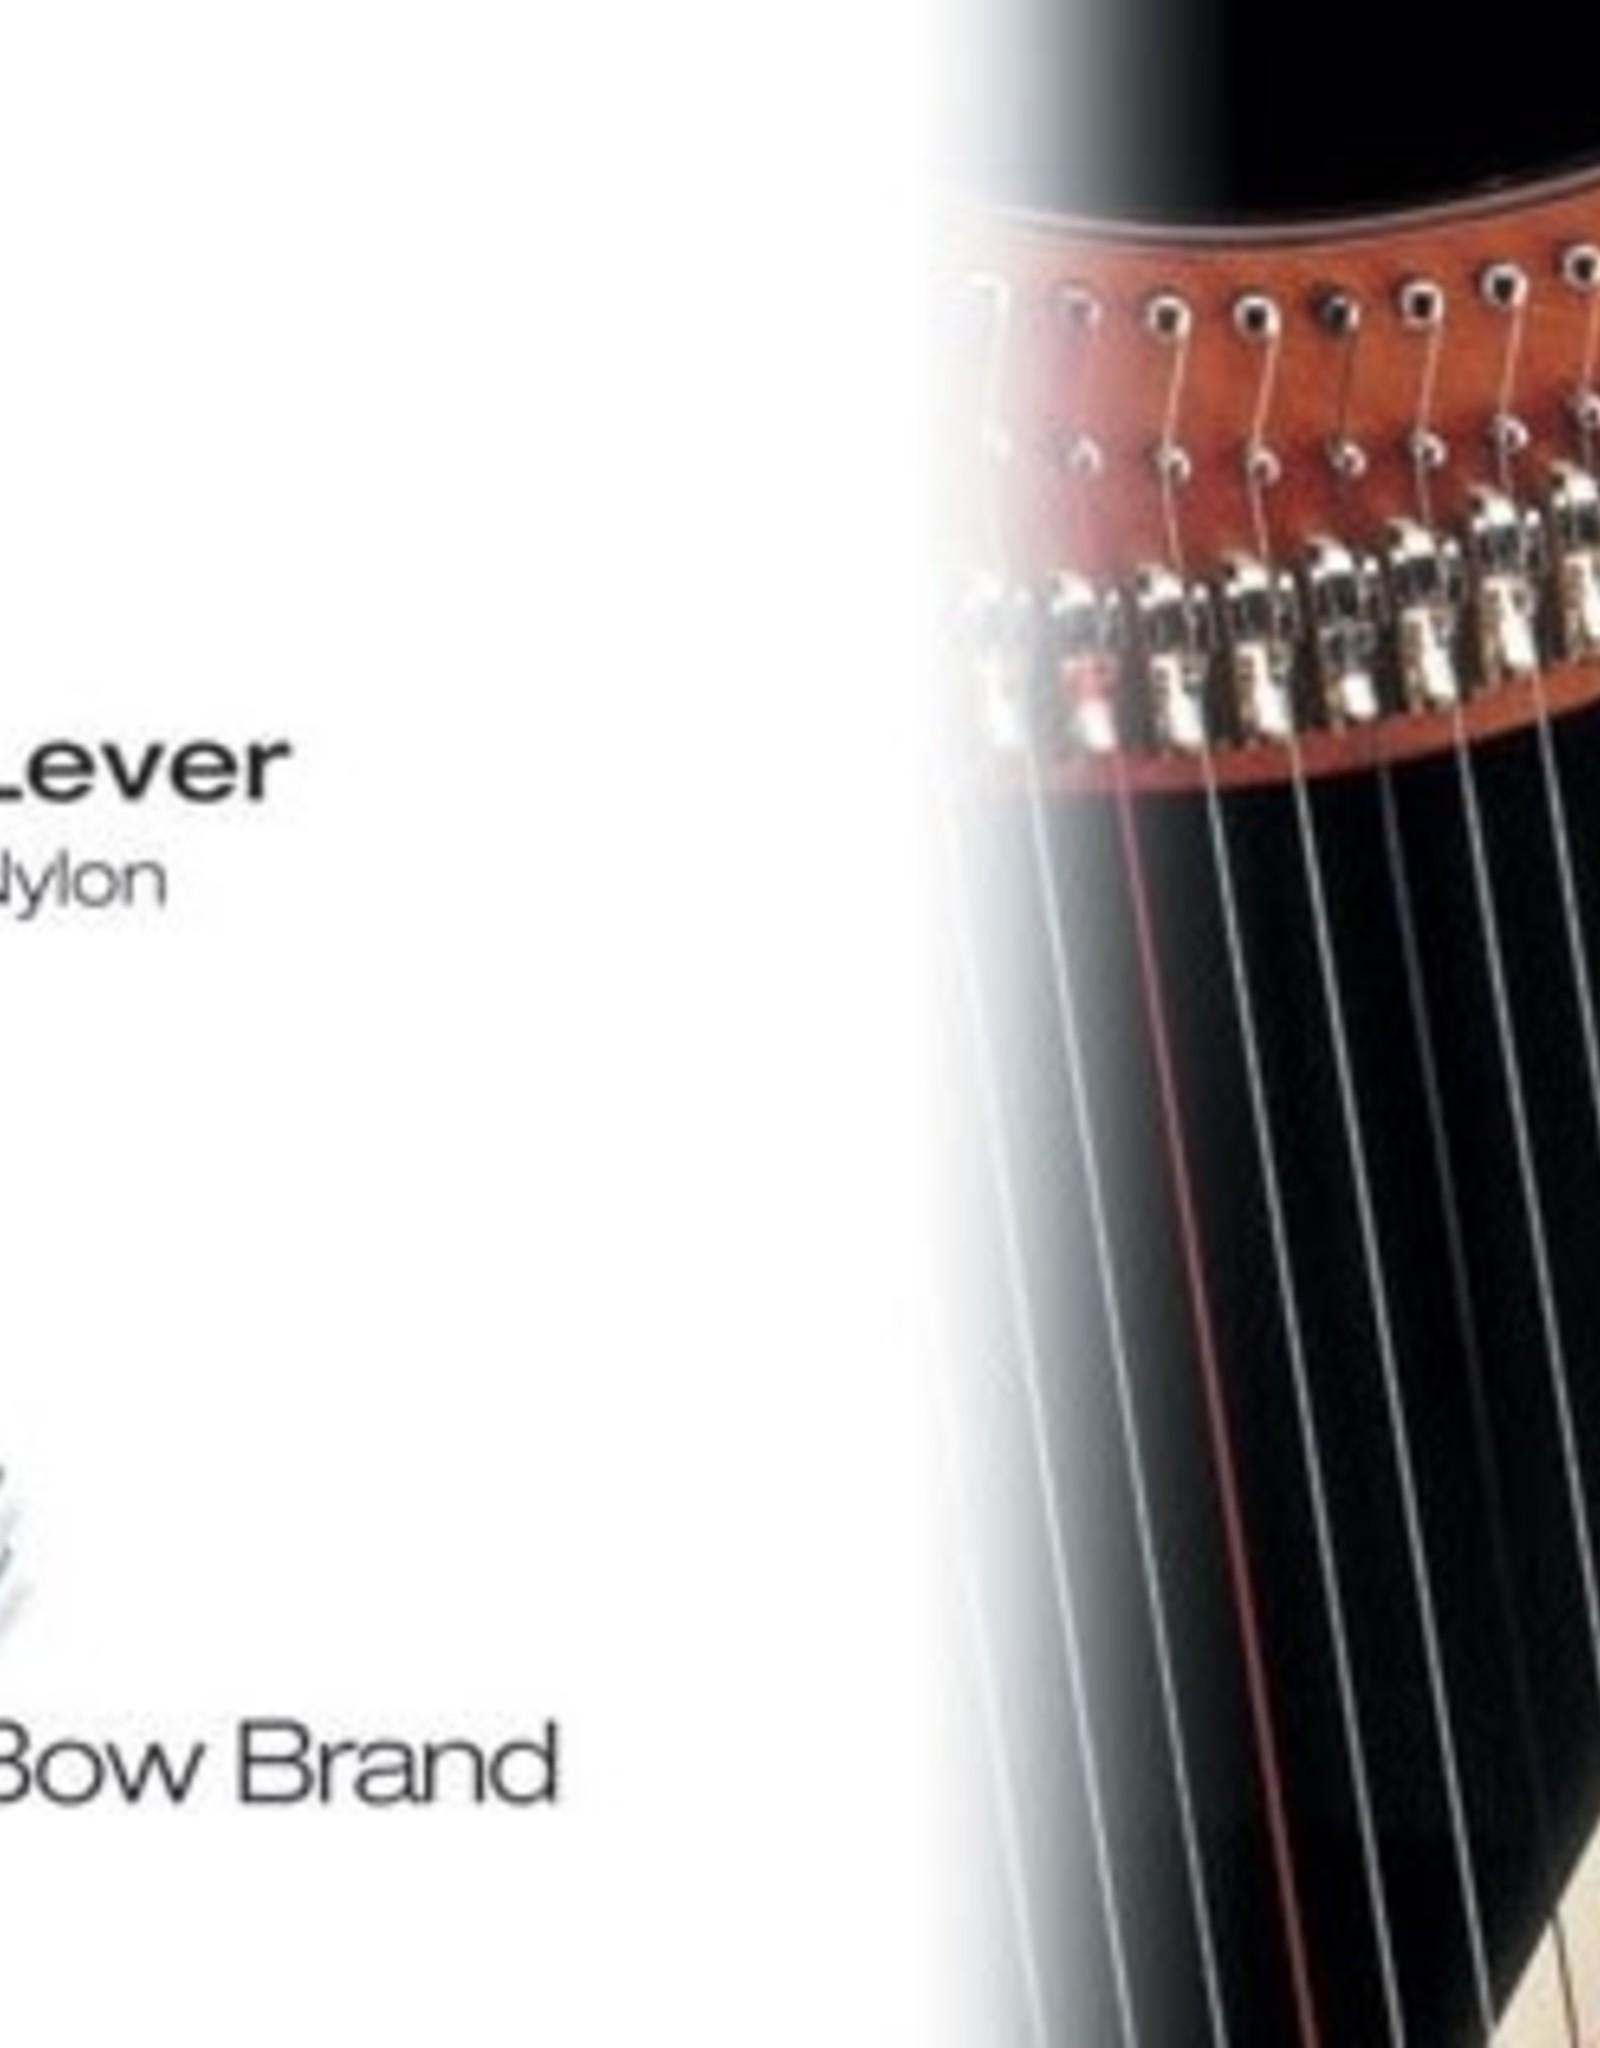 BOW BRAND  klep nylon - lever NYLON 28/4 fa